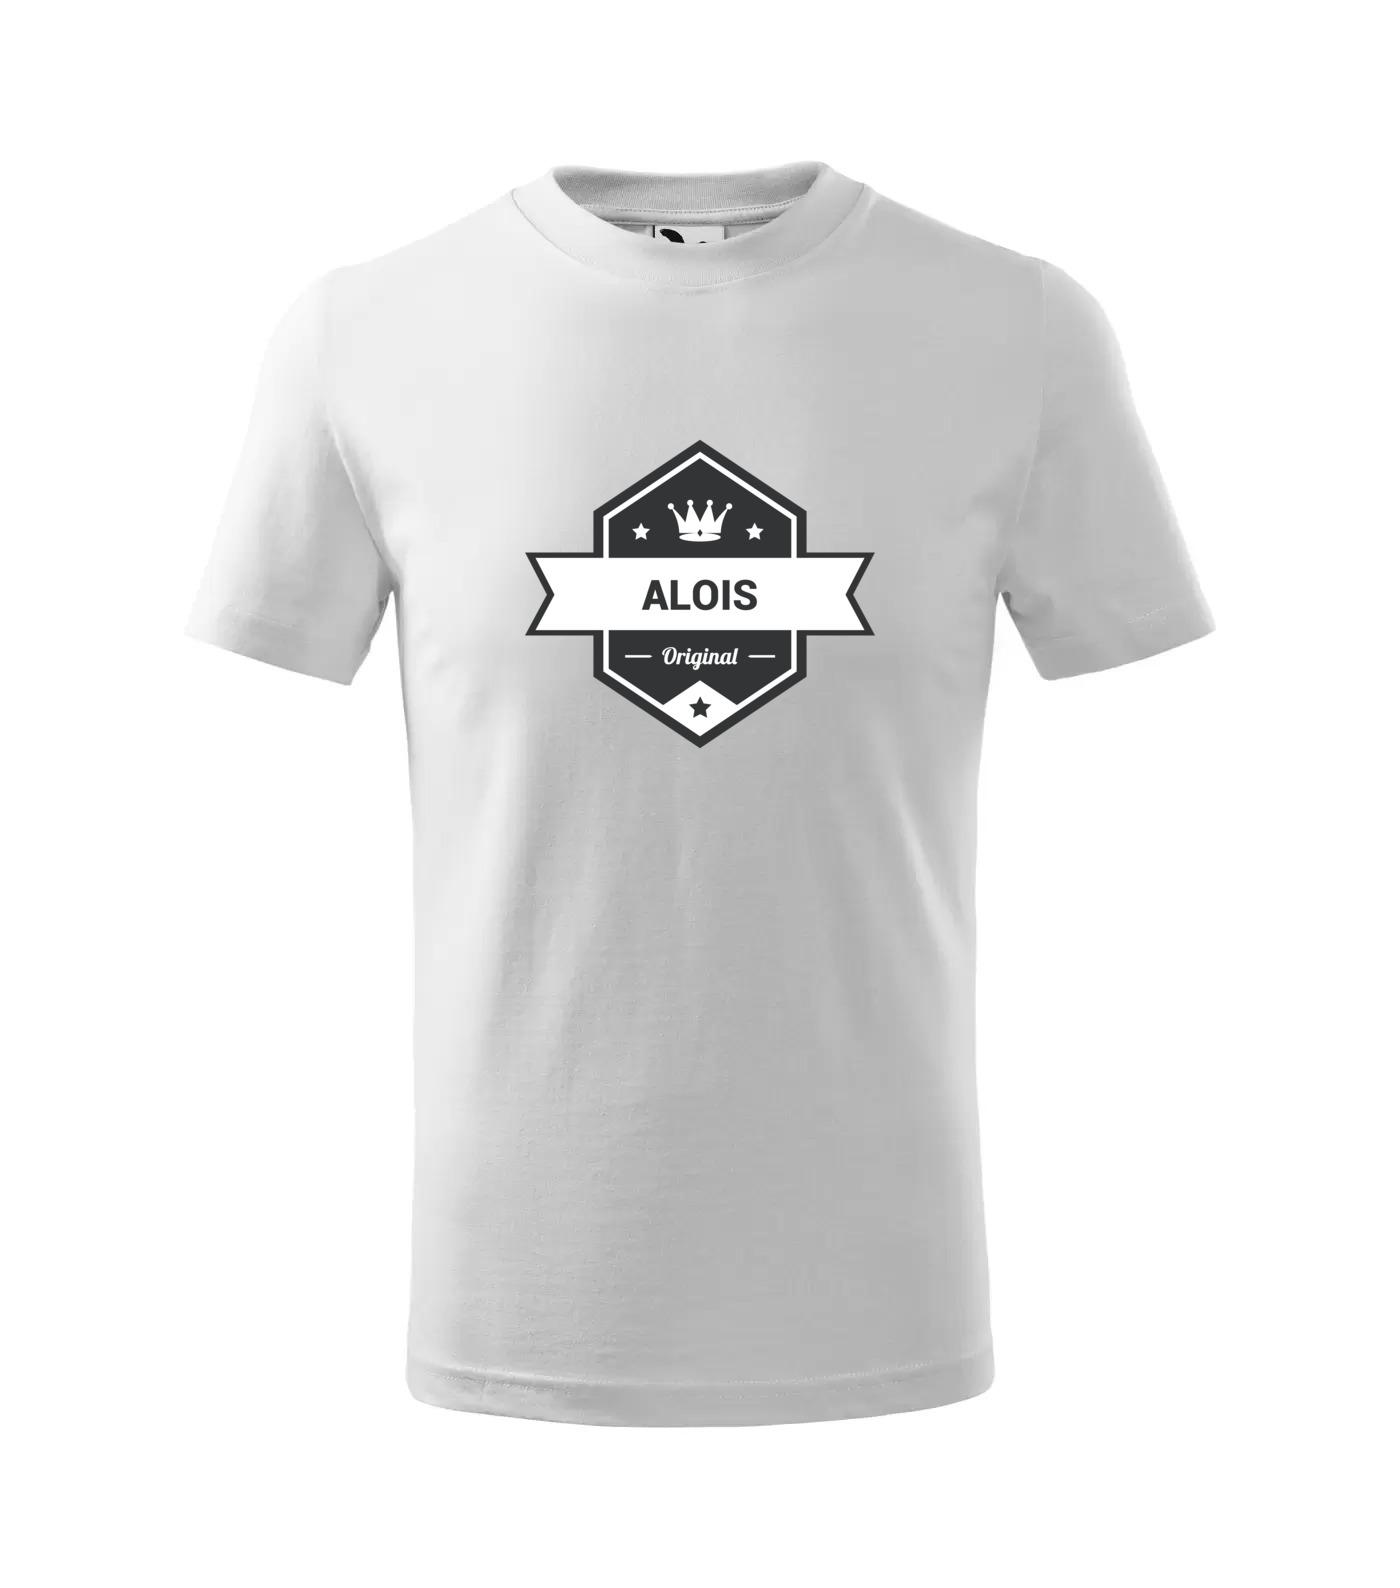 Tričko King Alois